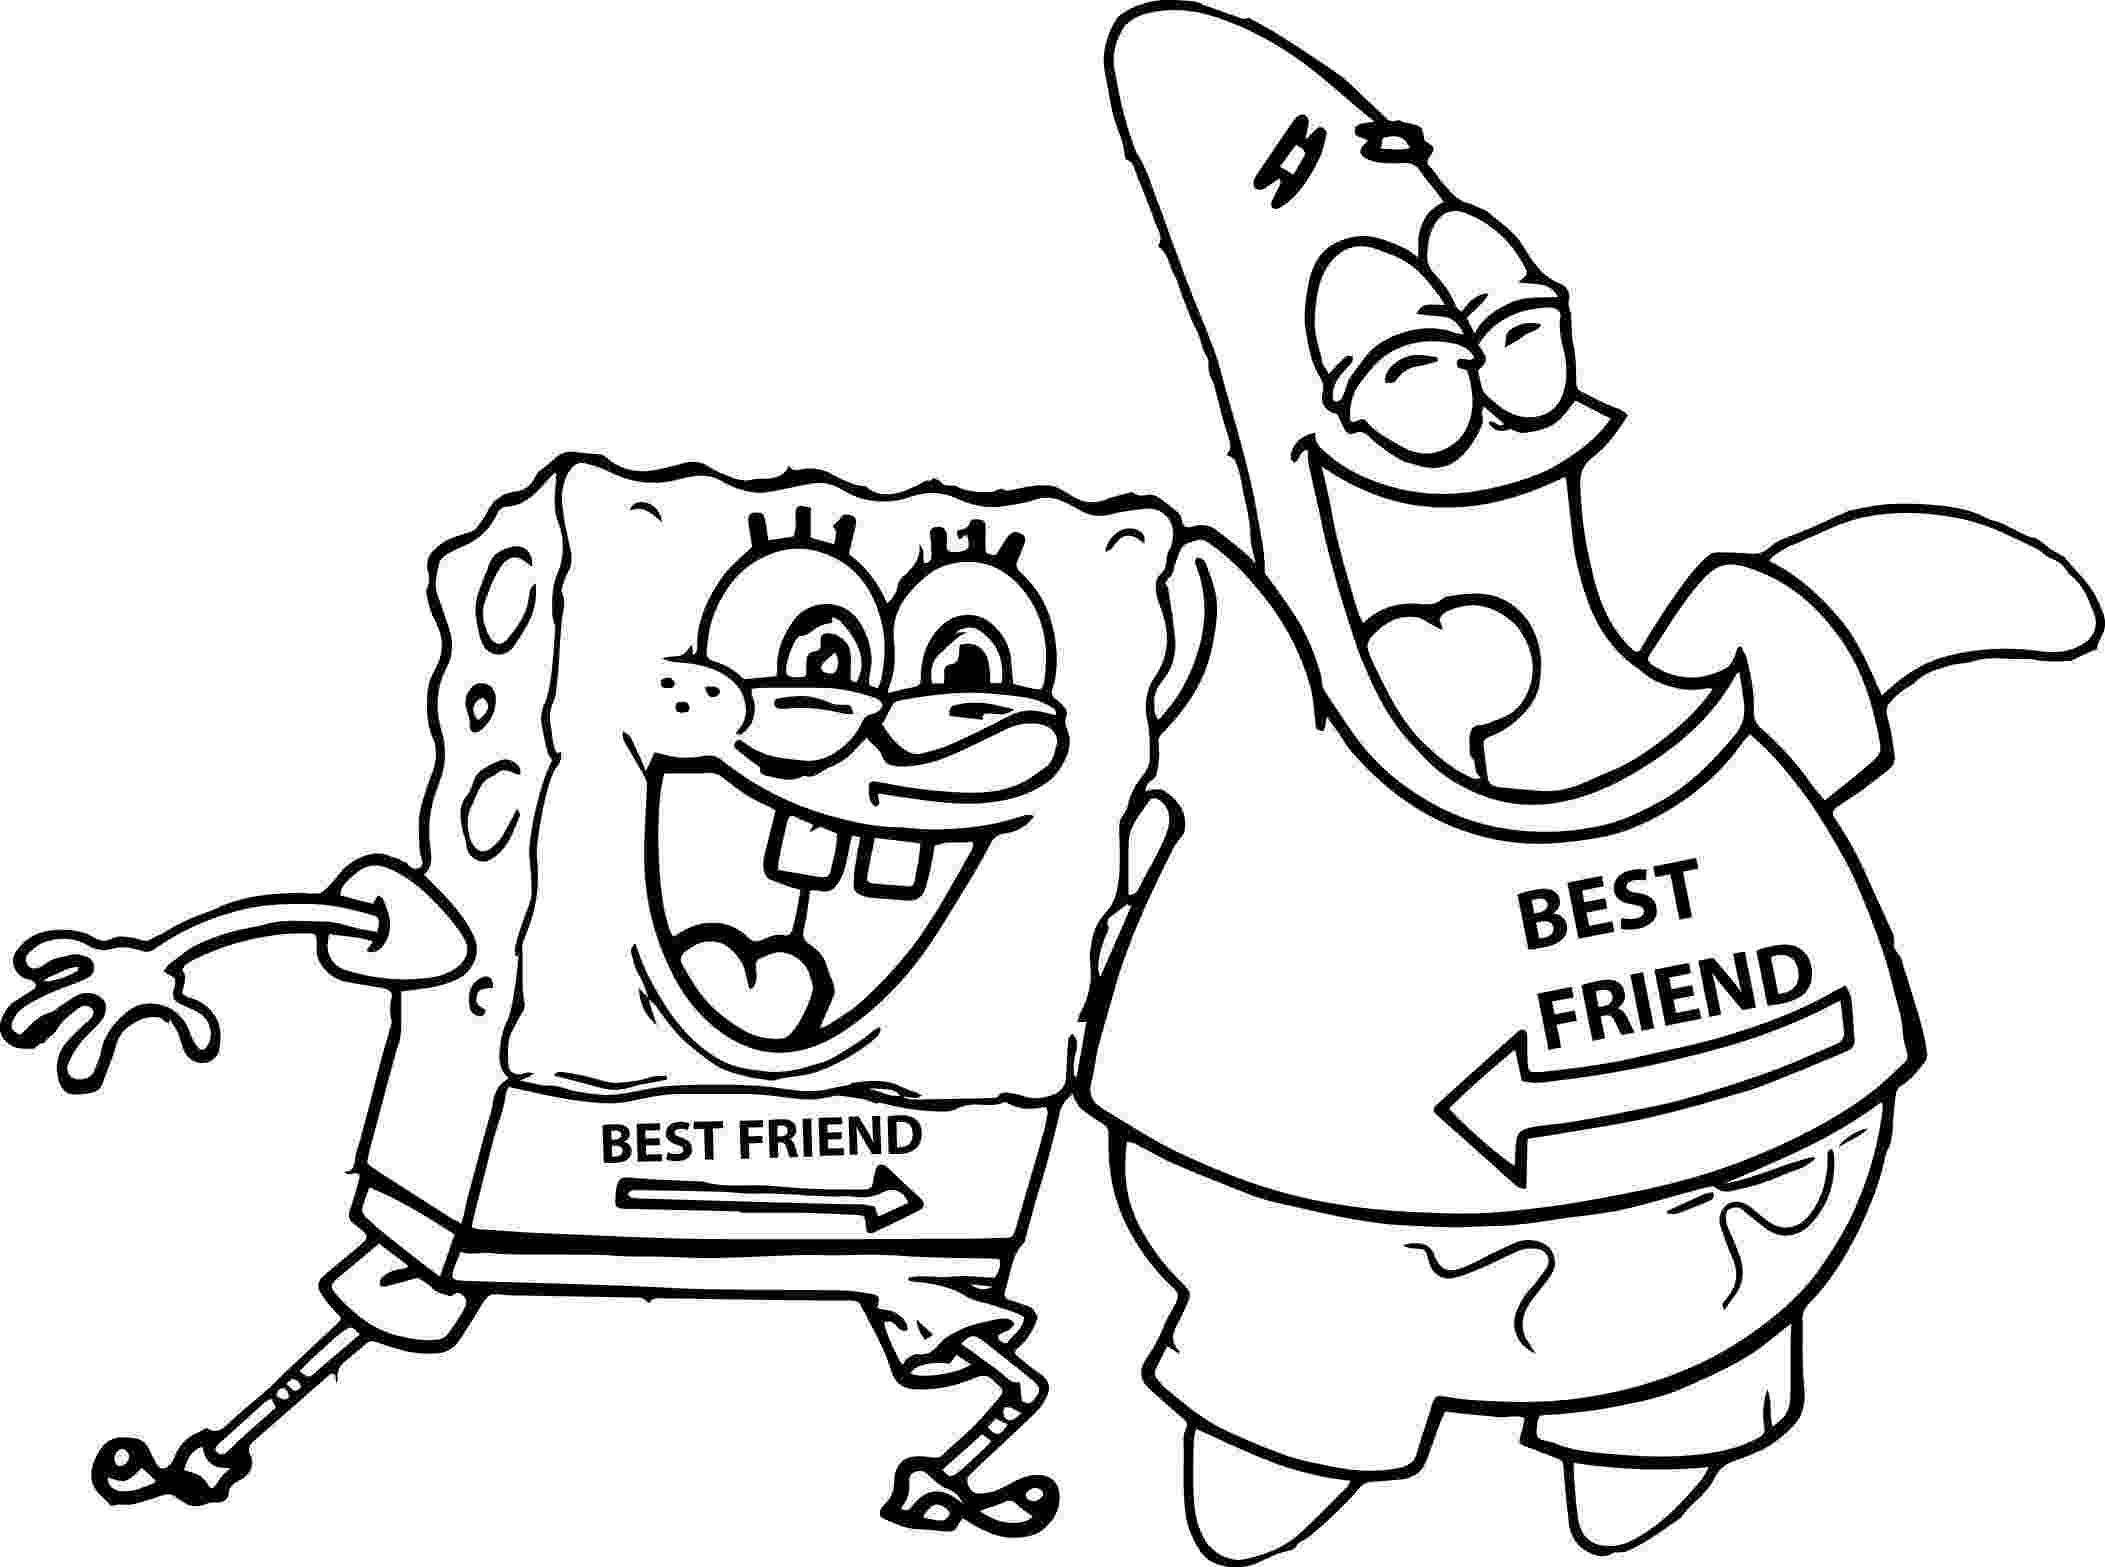 spongebob coloring sheets pdf printable spongebob coloring pages for kids cool2bkids sheets pdf spongebob coloring